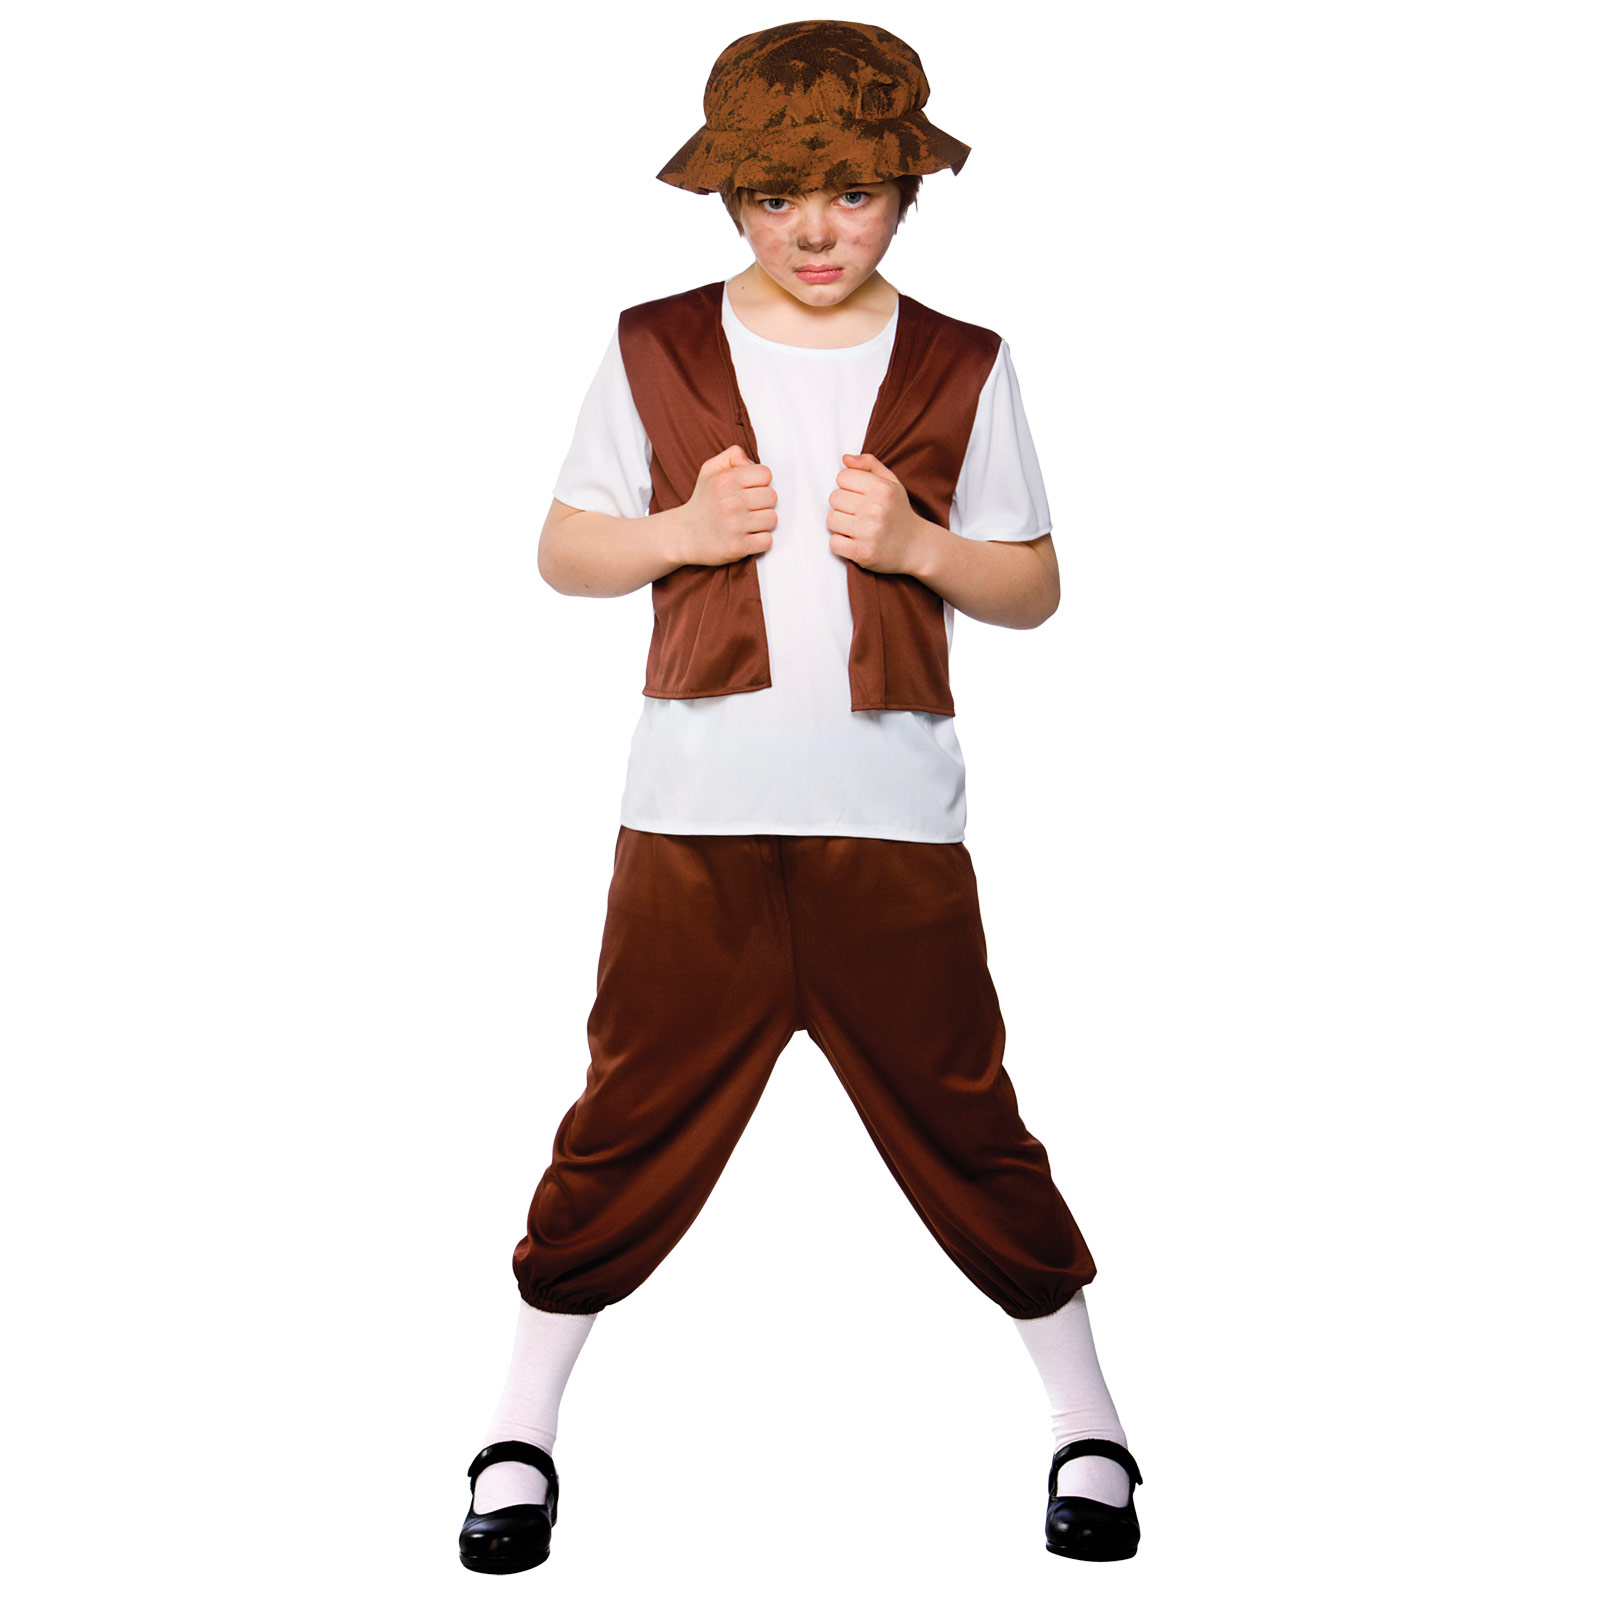 Boys Tudor Boy Costume Fancy Dress Up Halloween Party Poor Street ...